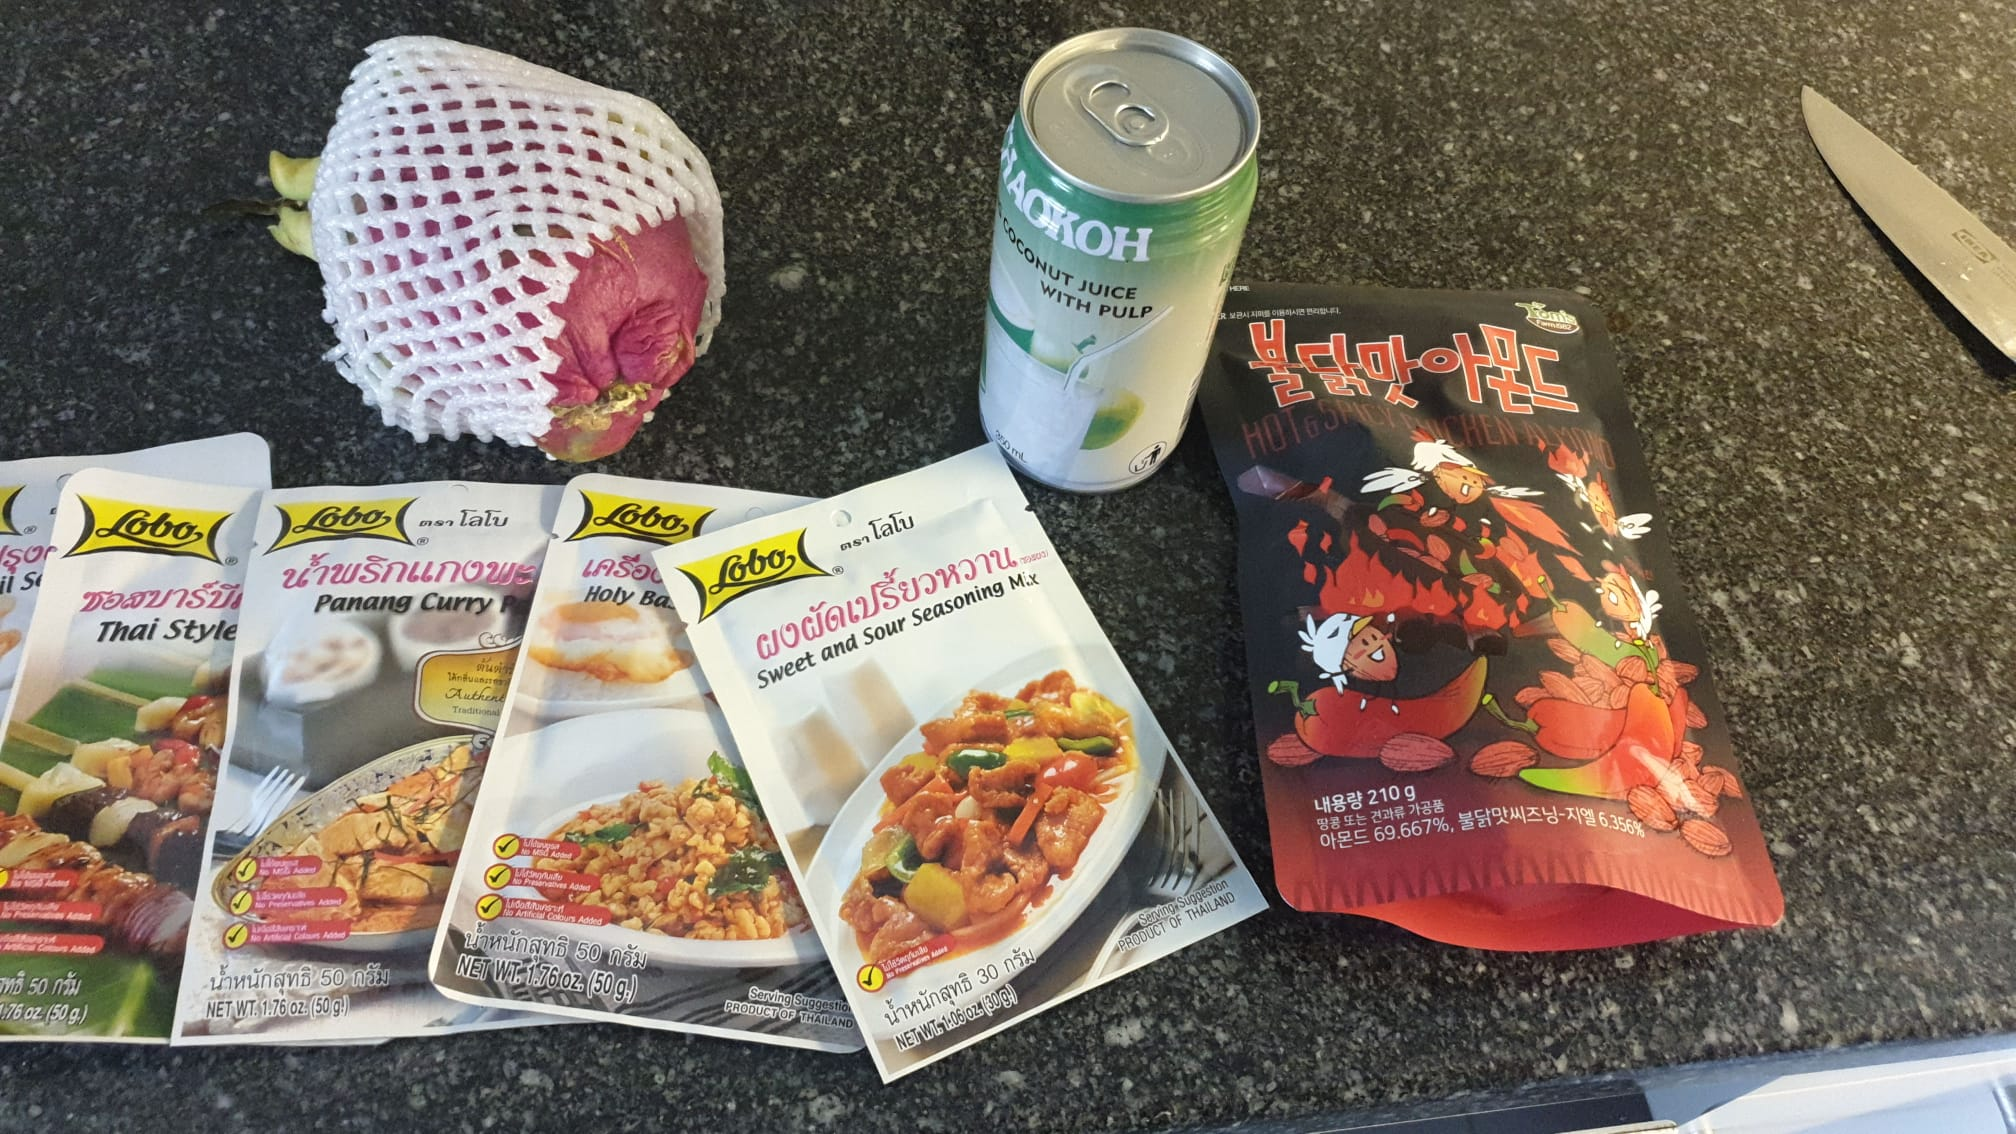 https://foodloader.net/xSh_2020-04-12_Verschiedene_Sachen_vom_Asiaten.jpg